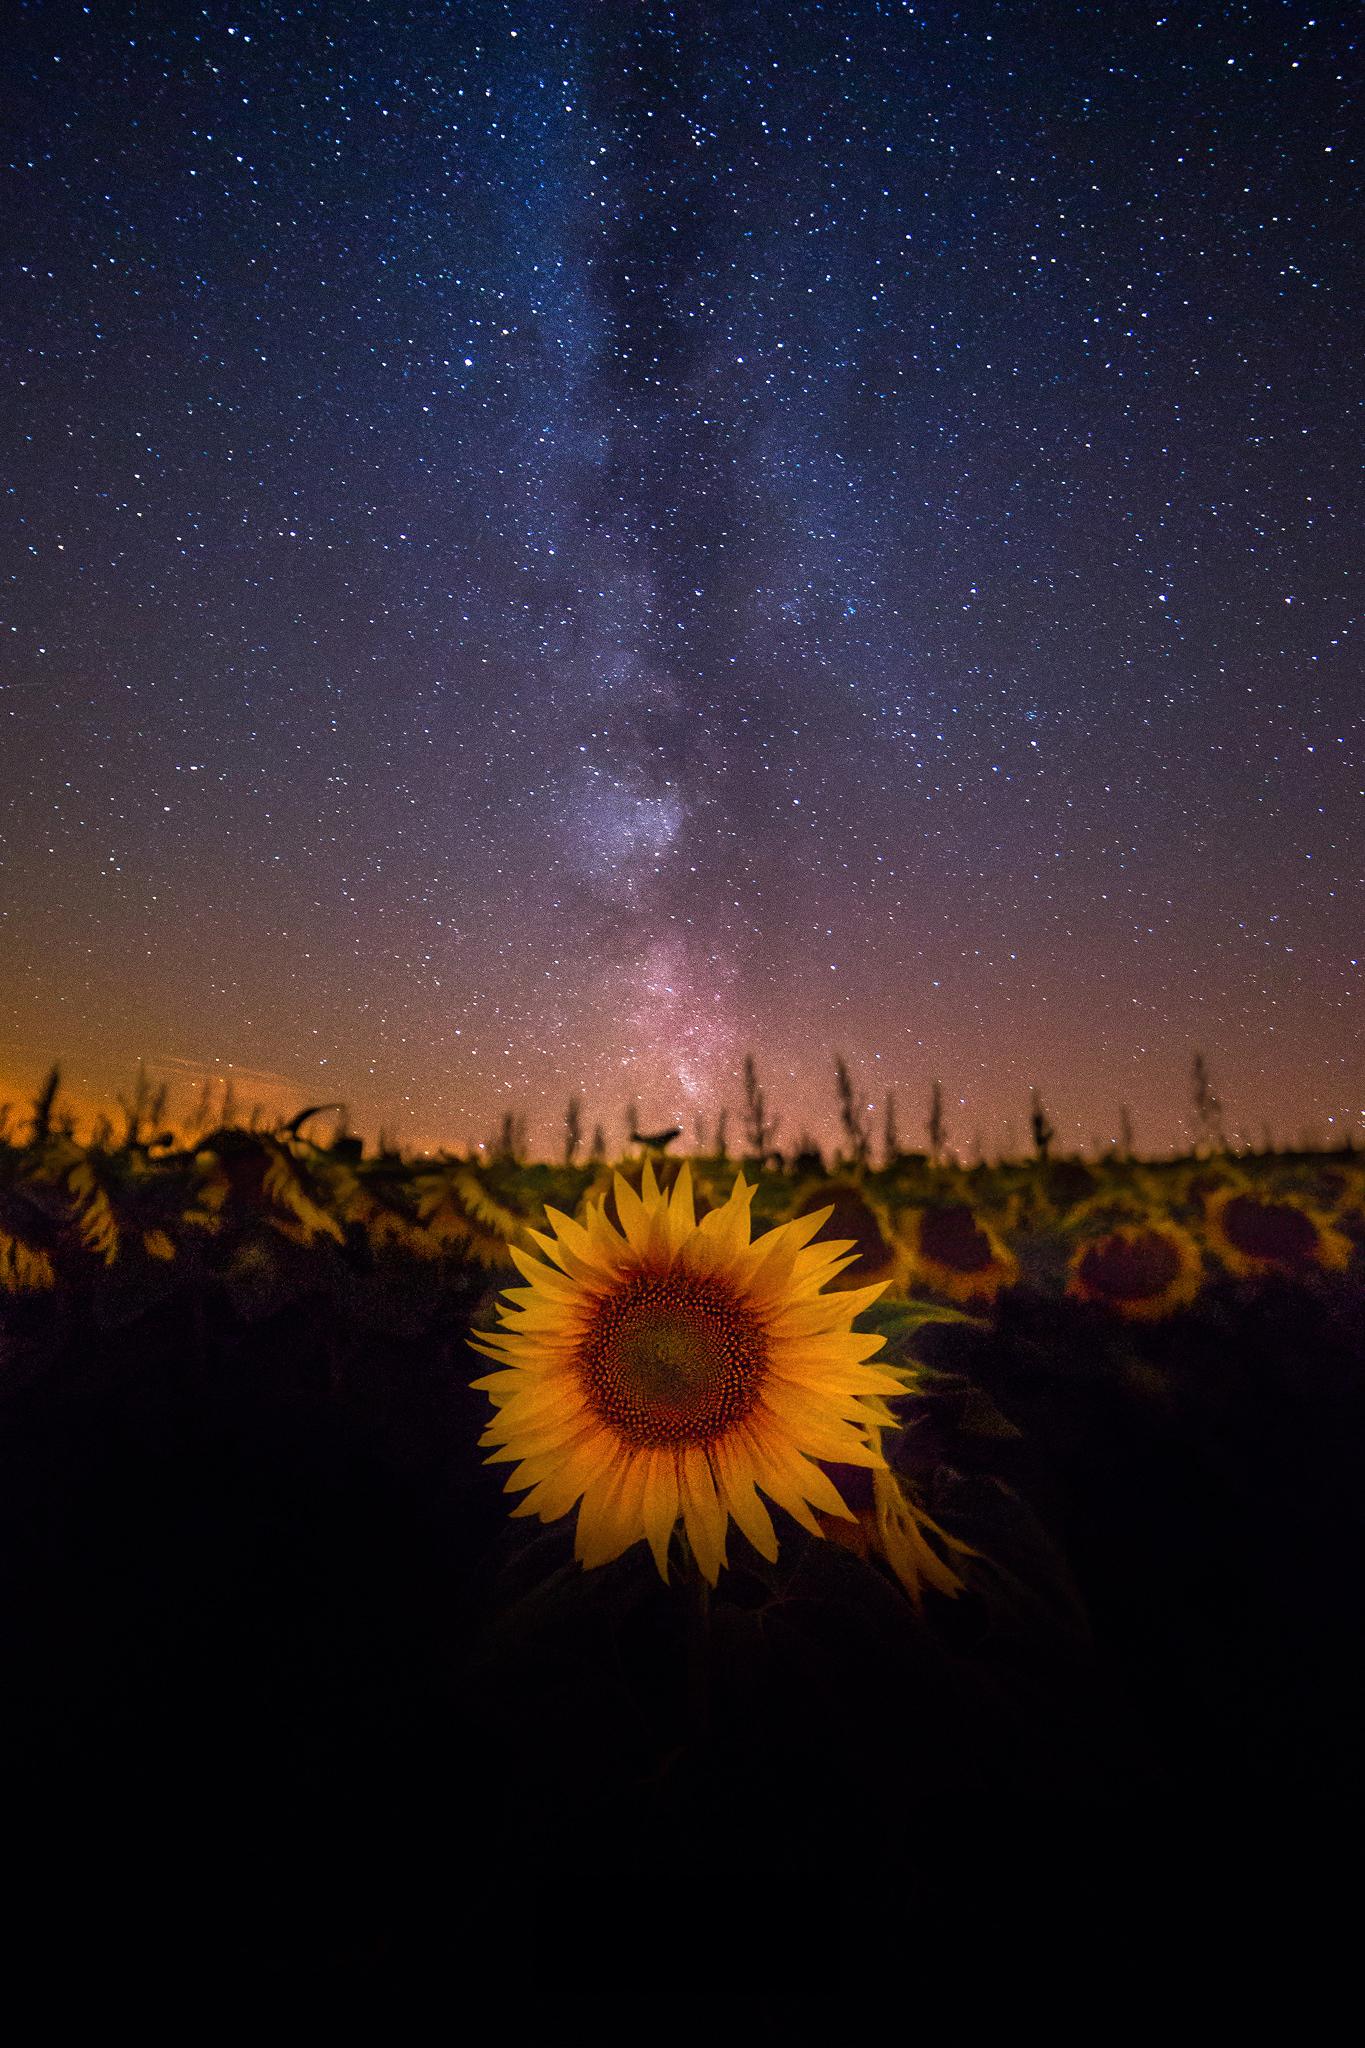 The-sun-at-Night.jpg